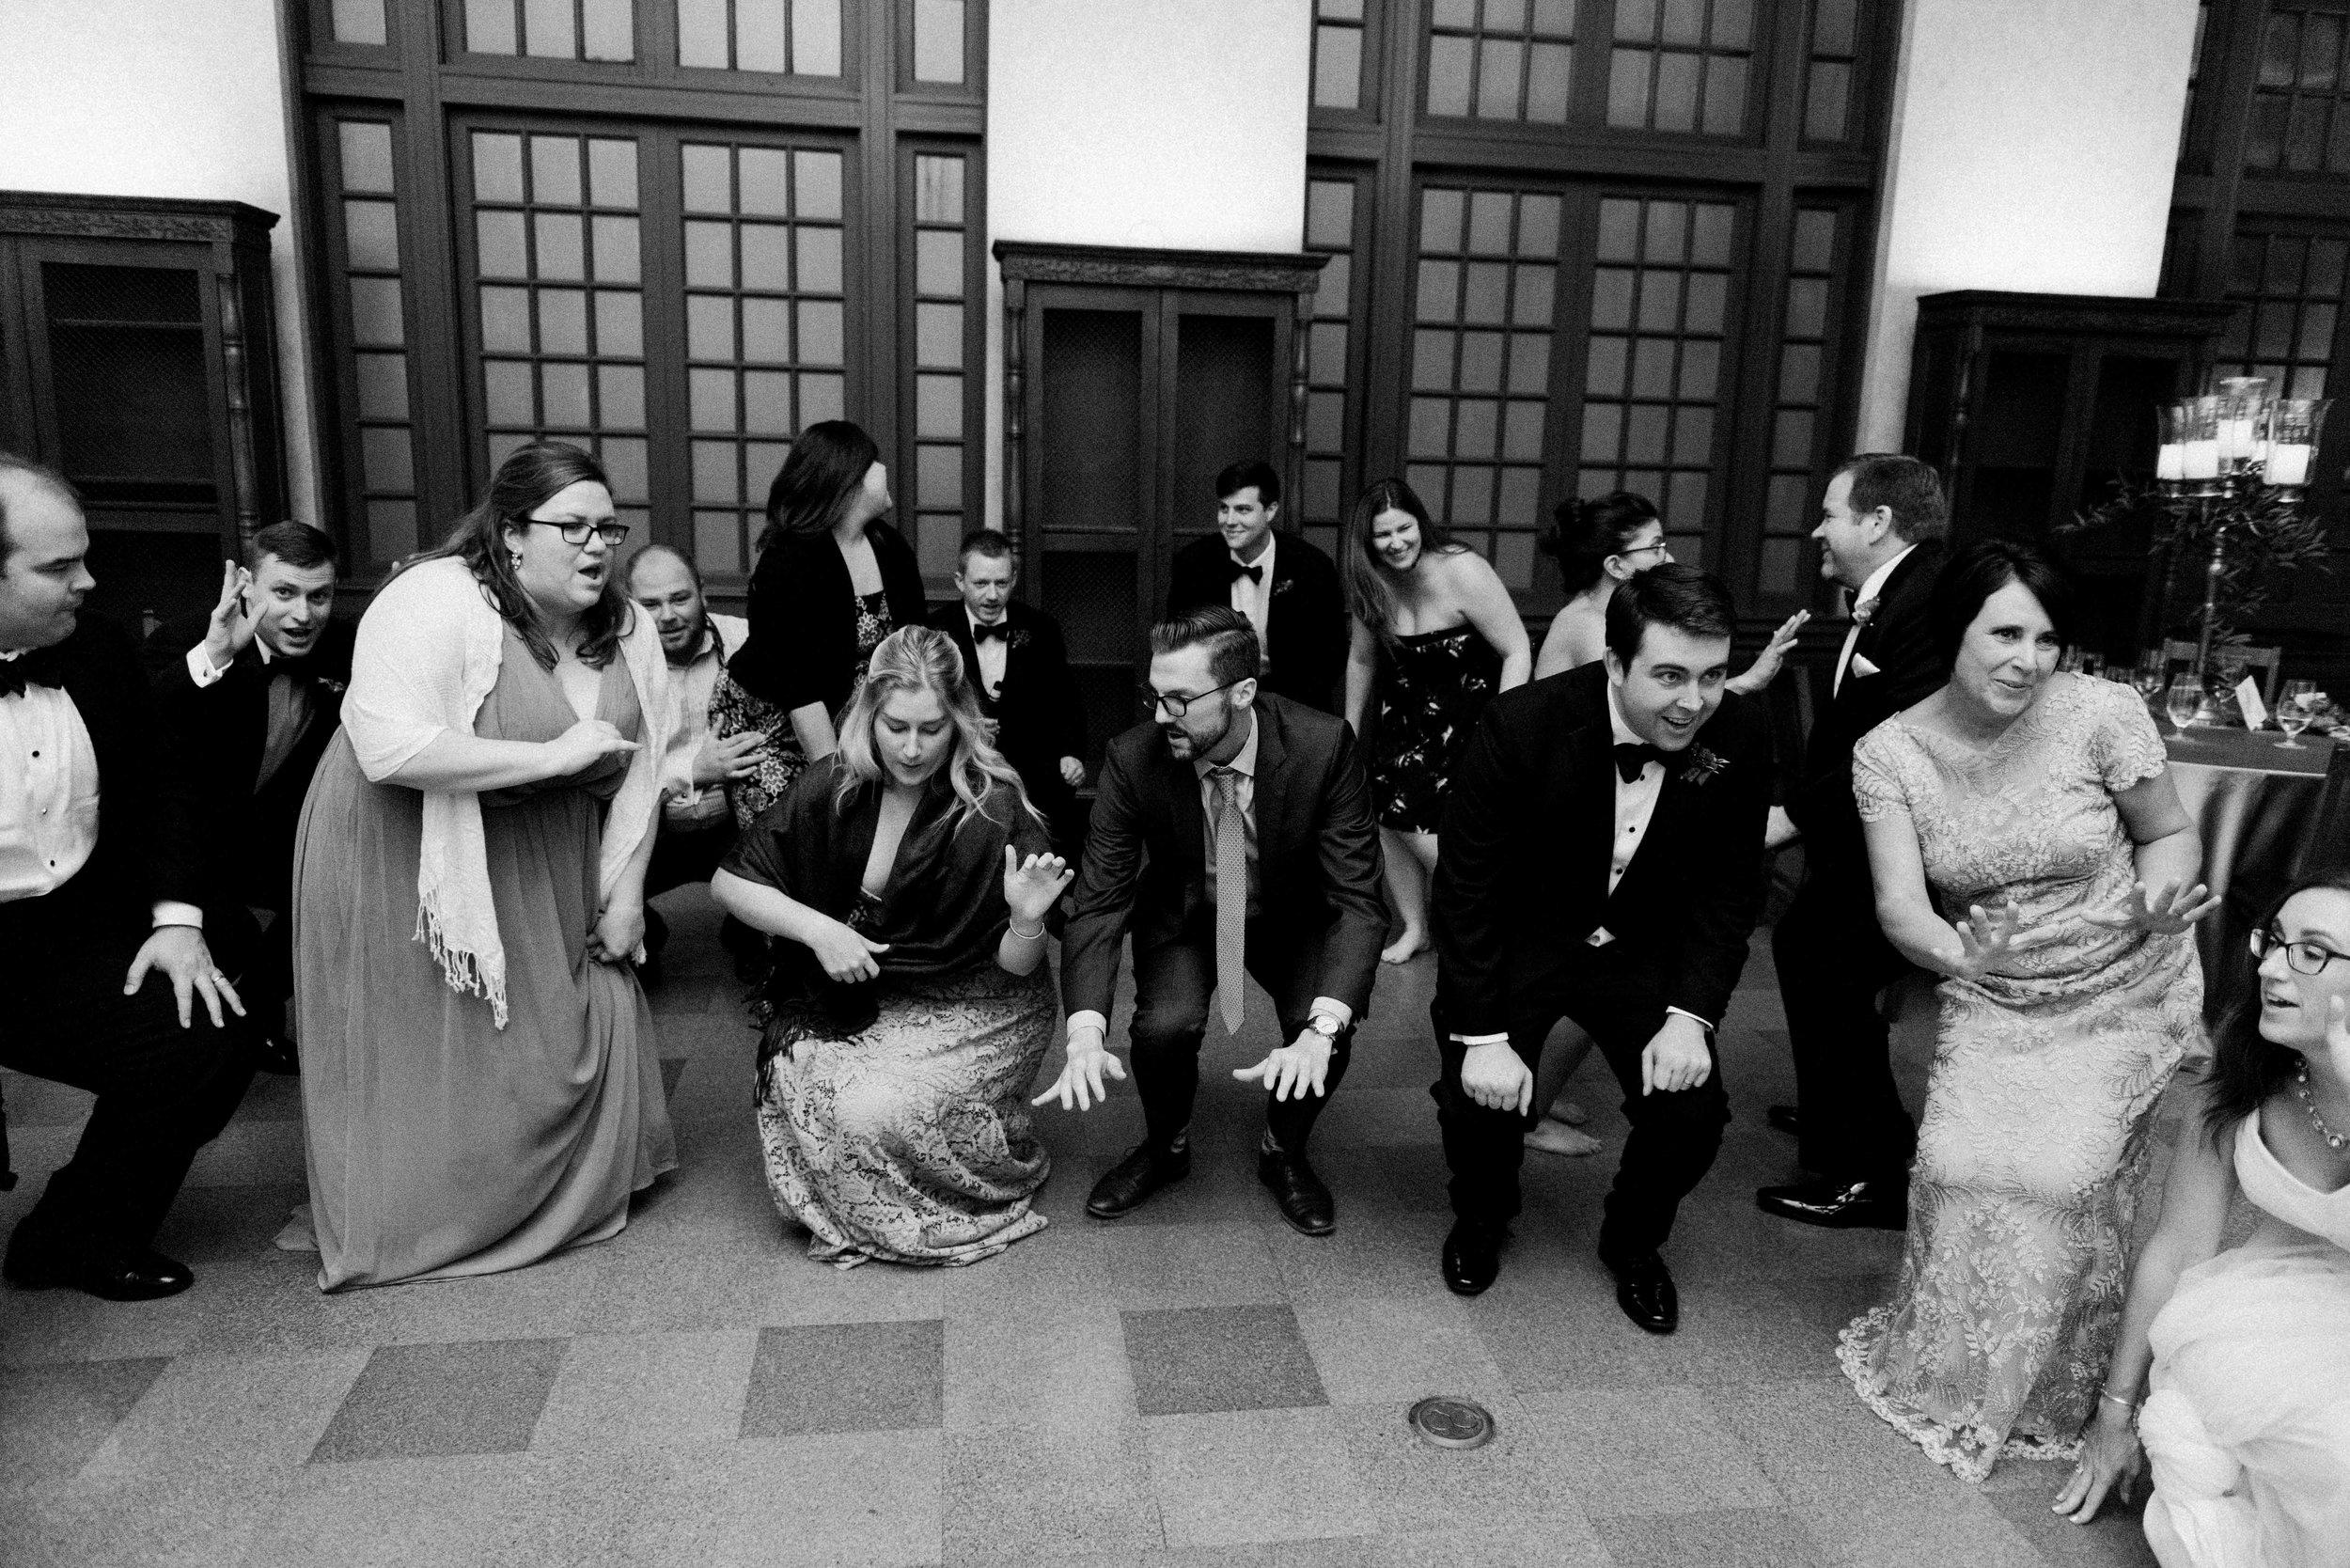 The-Knot-Texas-Fine-Art-Wedding-Film-Destination-Photographer-Houston-Austin-Dallas-New-Orleans-Julia-Ideson-Library-Event-Dana-Josh-Fernandez-Photograph-Top-Best-87.jpg